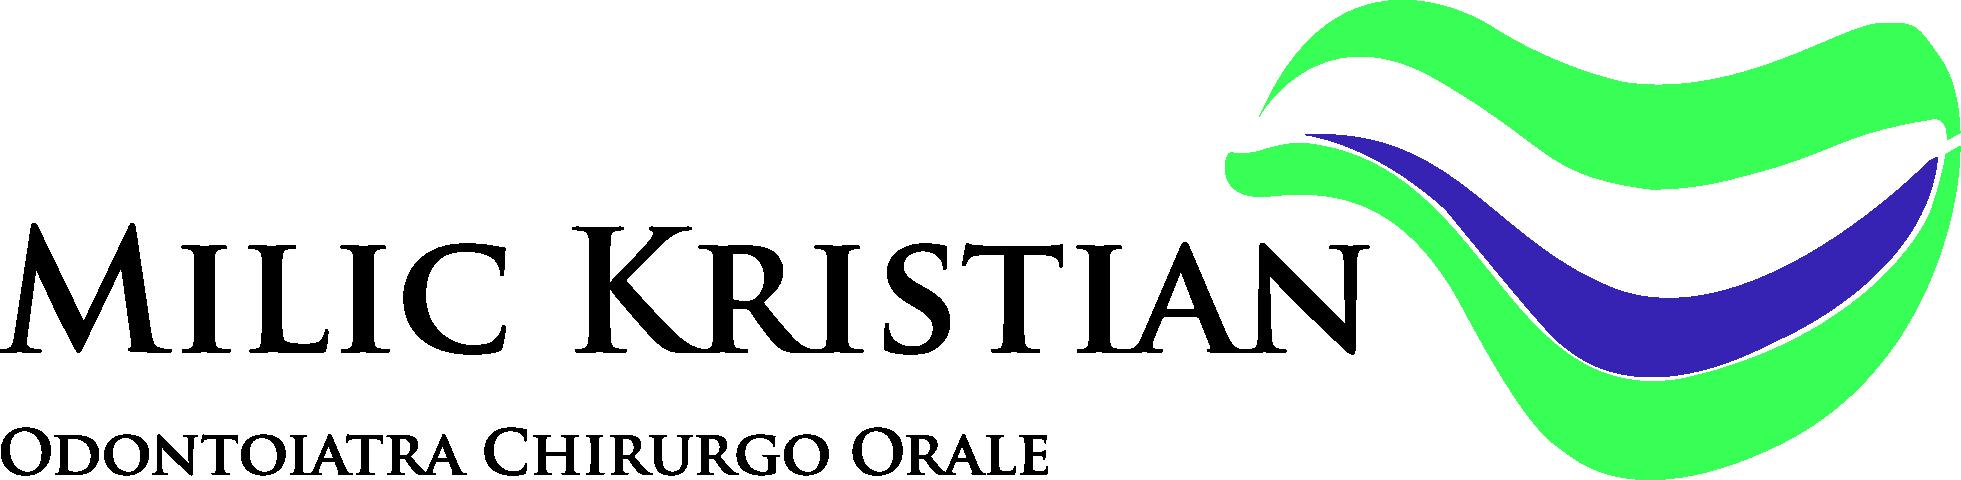 logo Milic